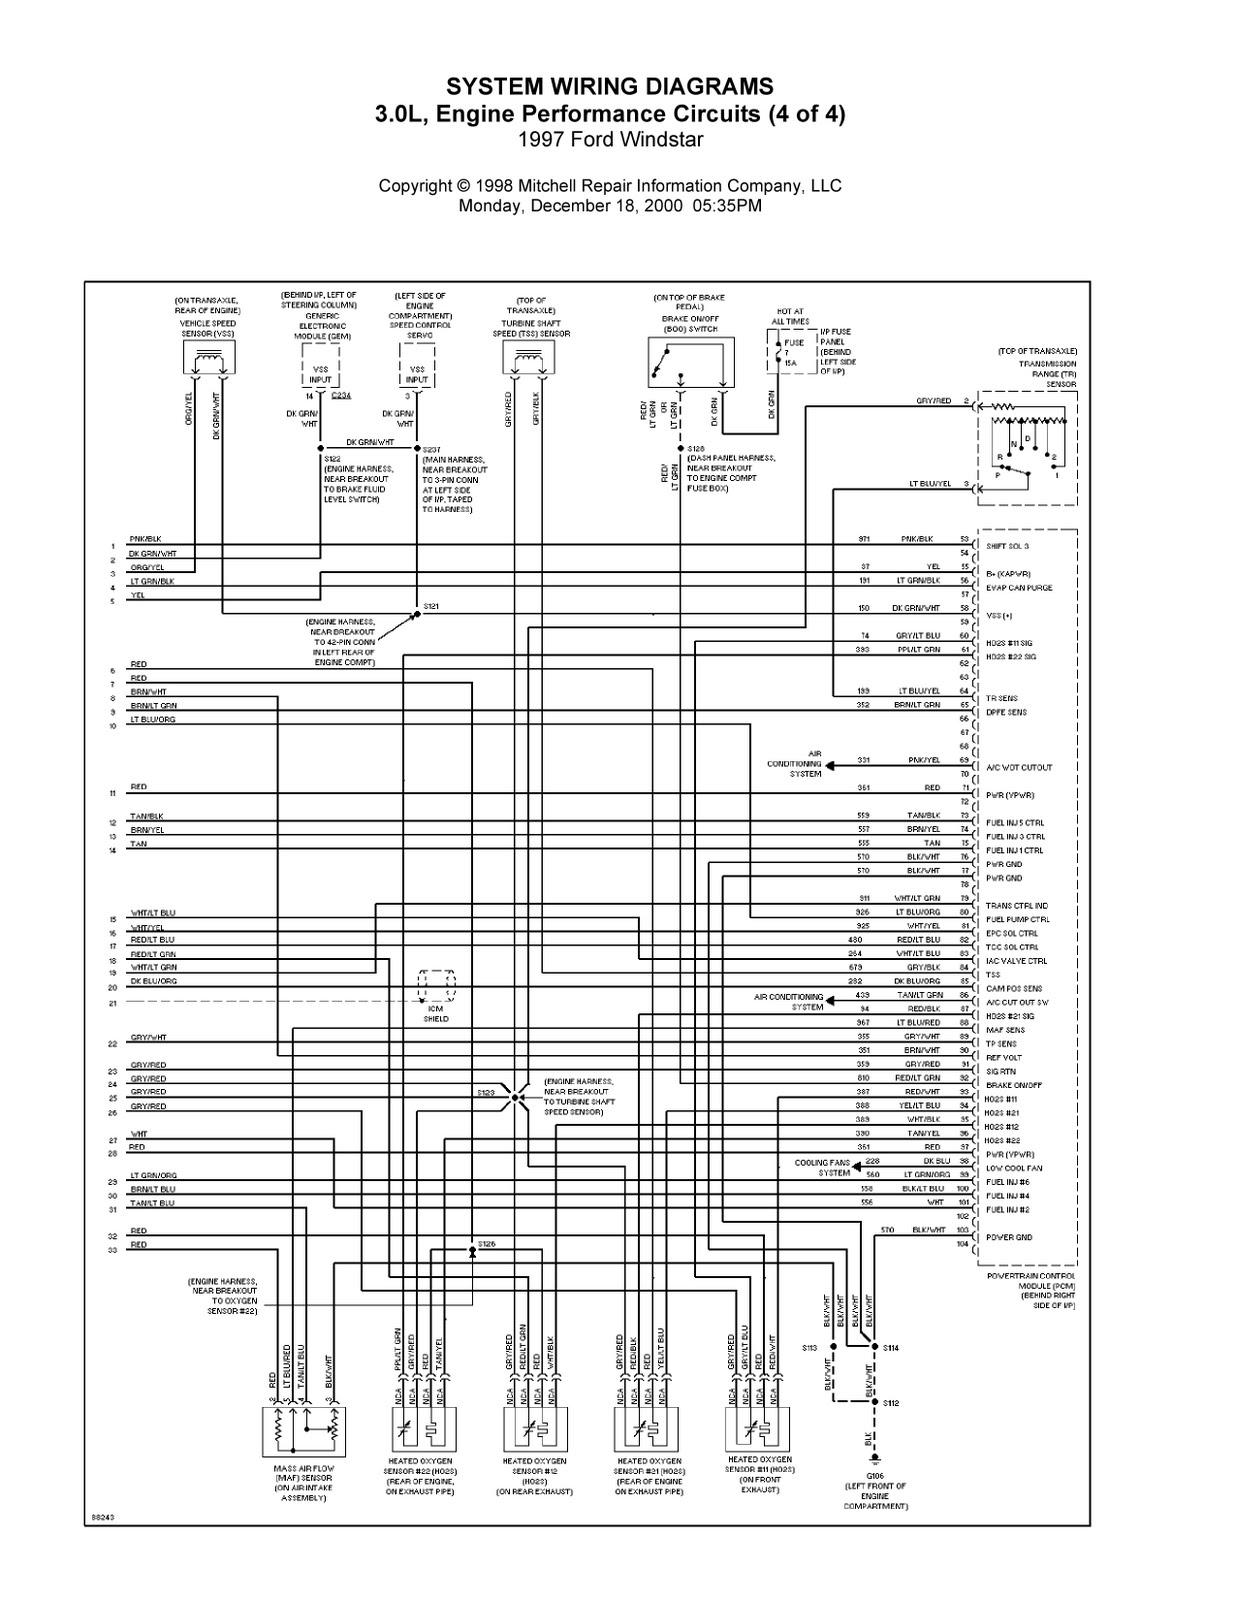 2001 ford windstar radio wiring diagram for frigidaire refrigerator system diagrams engine performance circuits bmw e46